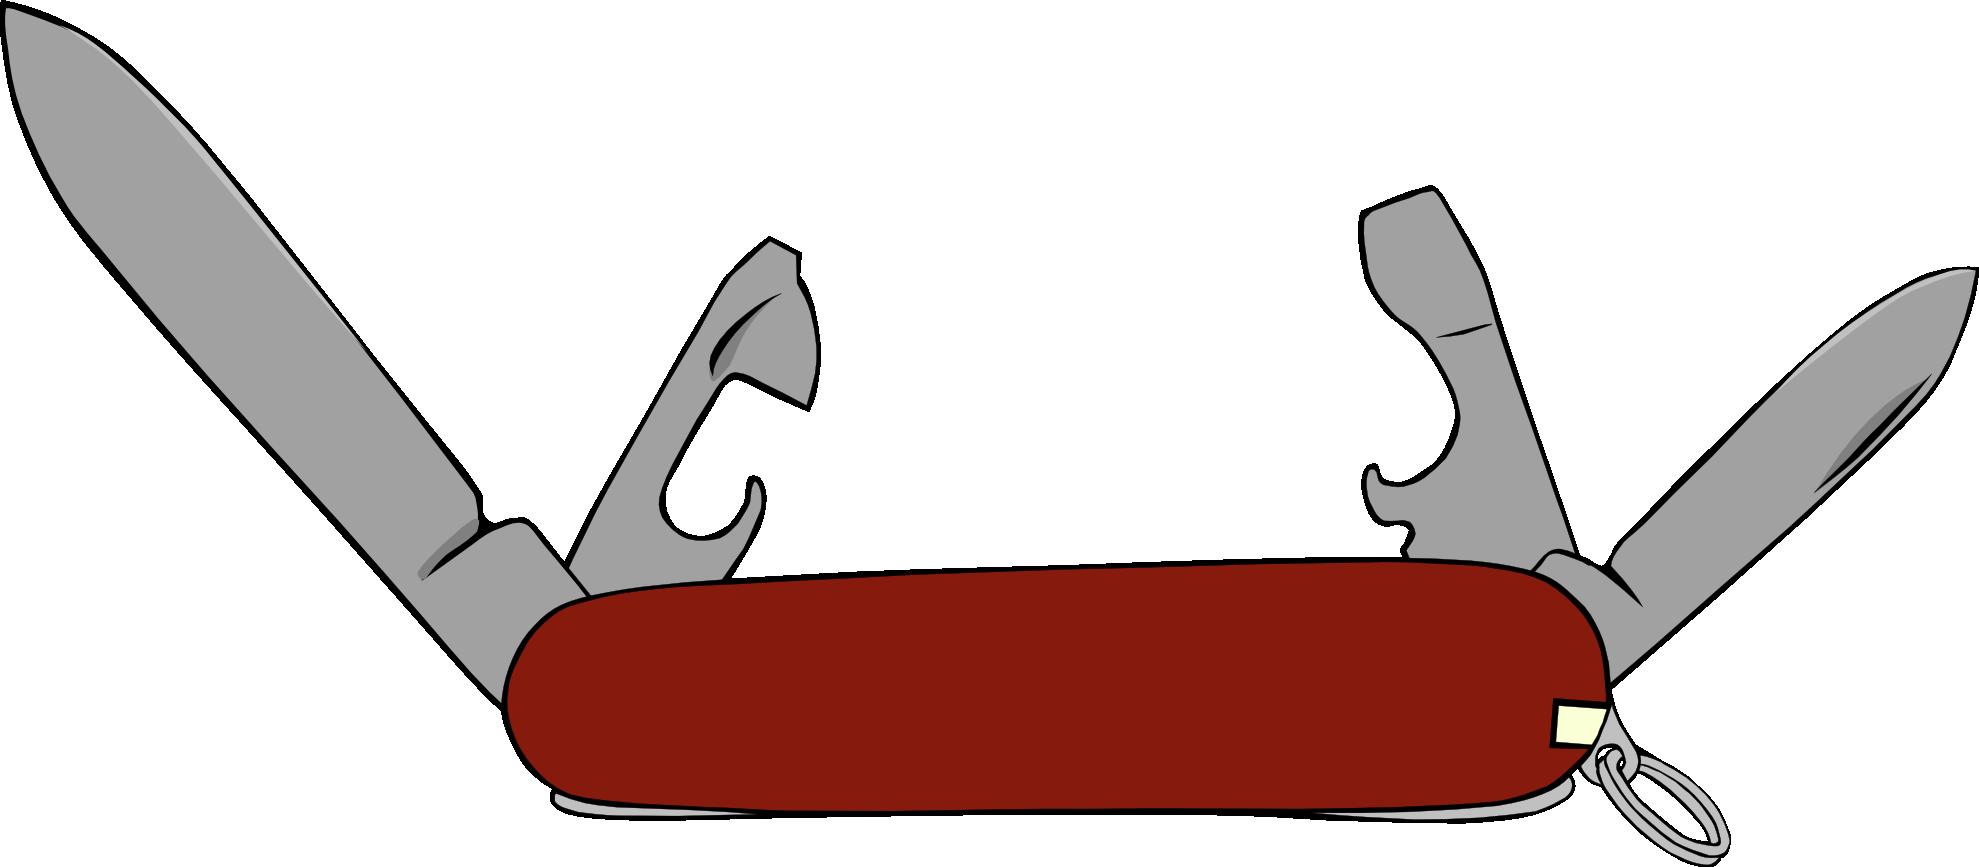 Swiss knife clipart.